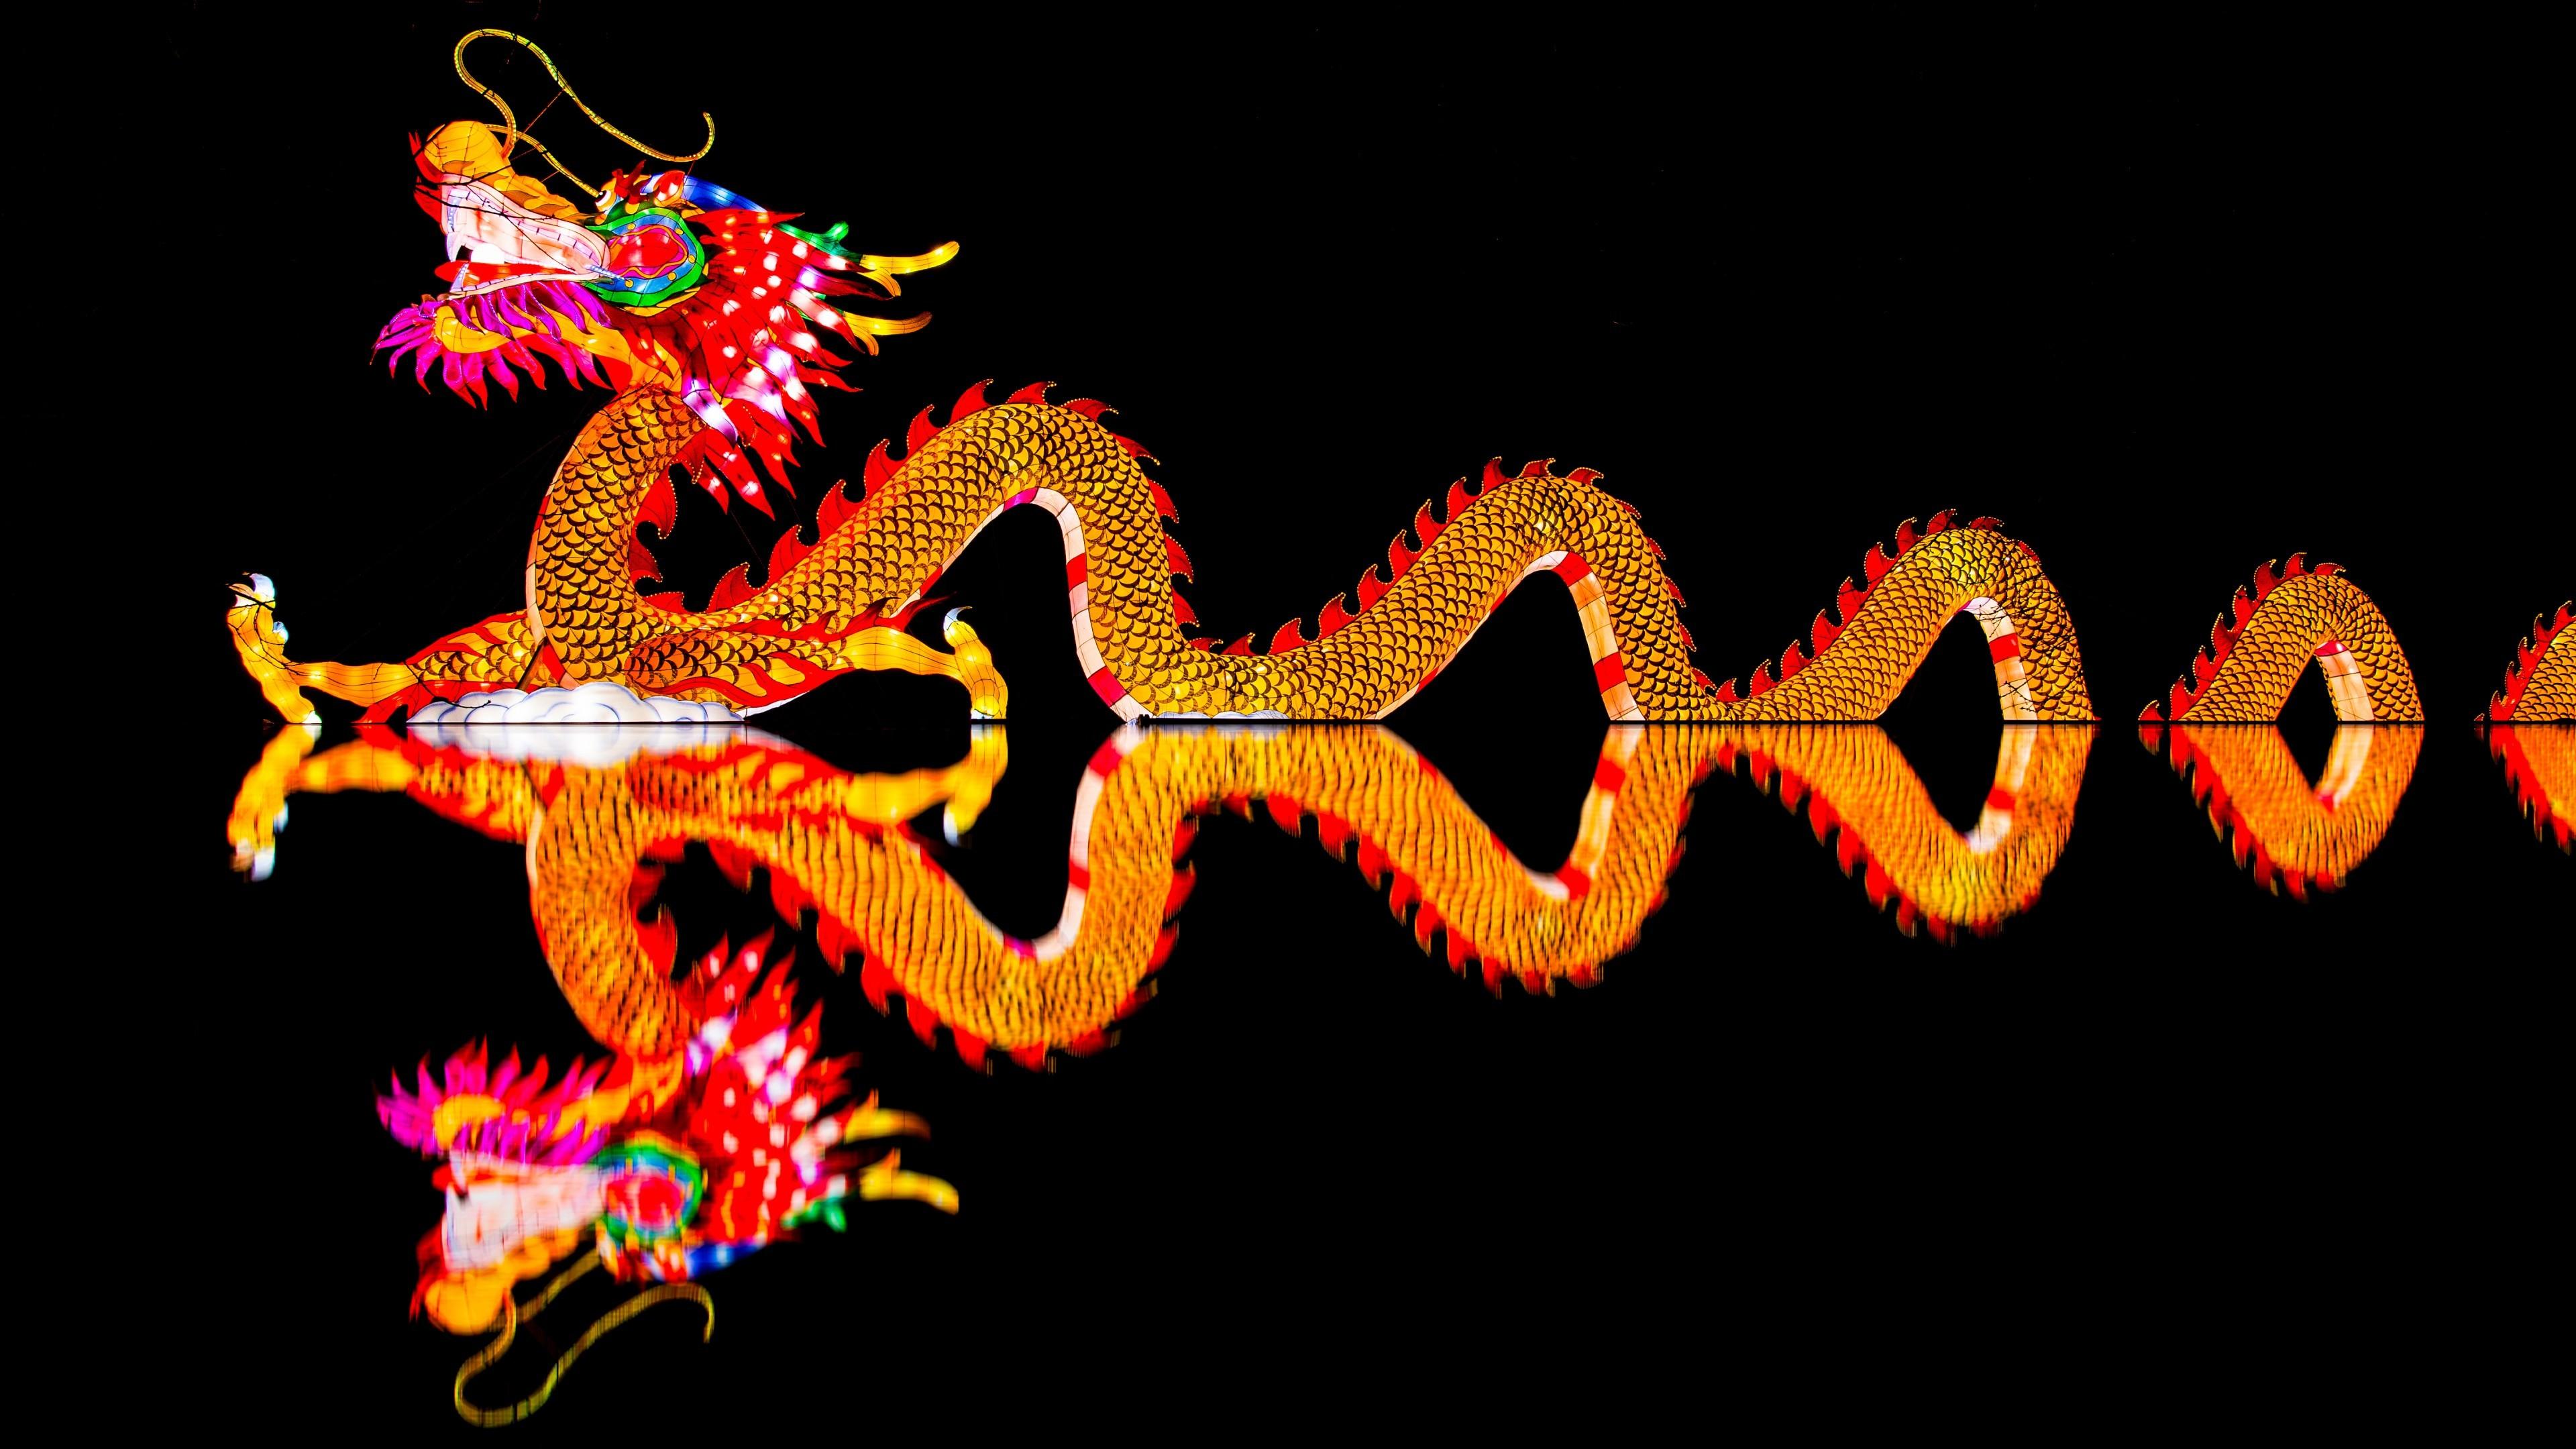 China Dragon Throne   Wallpaper China Lights, Chinese Dragon, 4K, 5K,  Photography